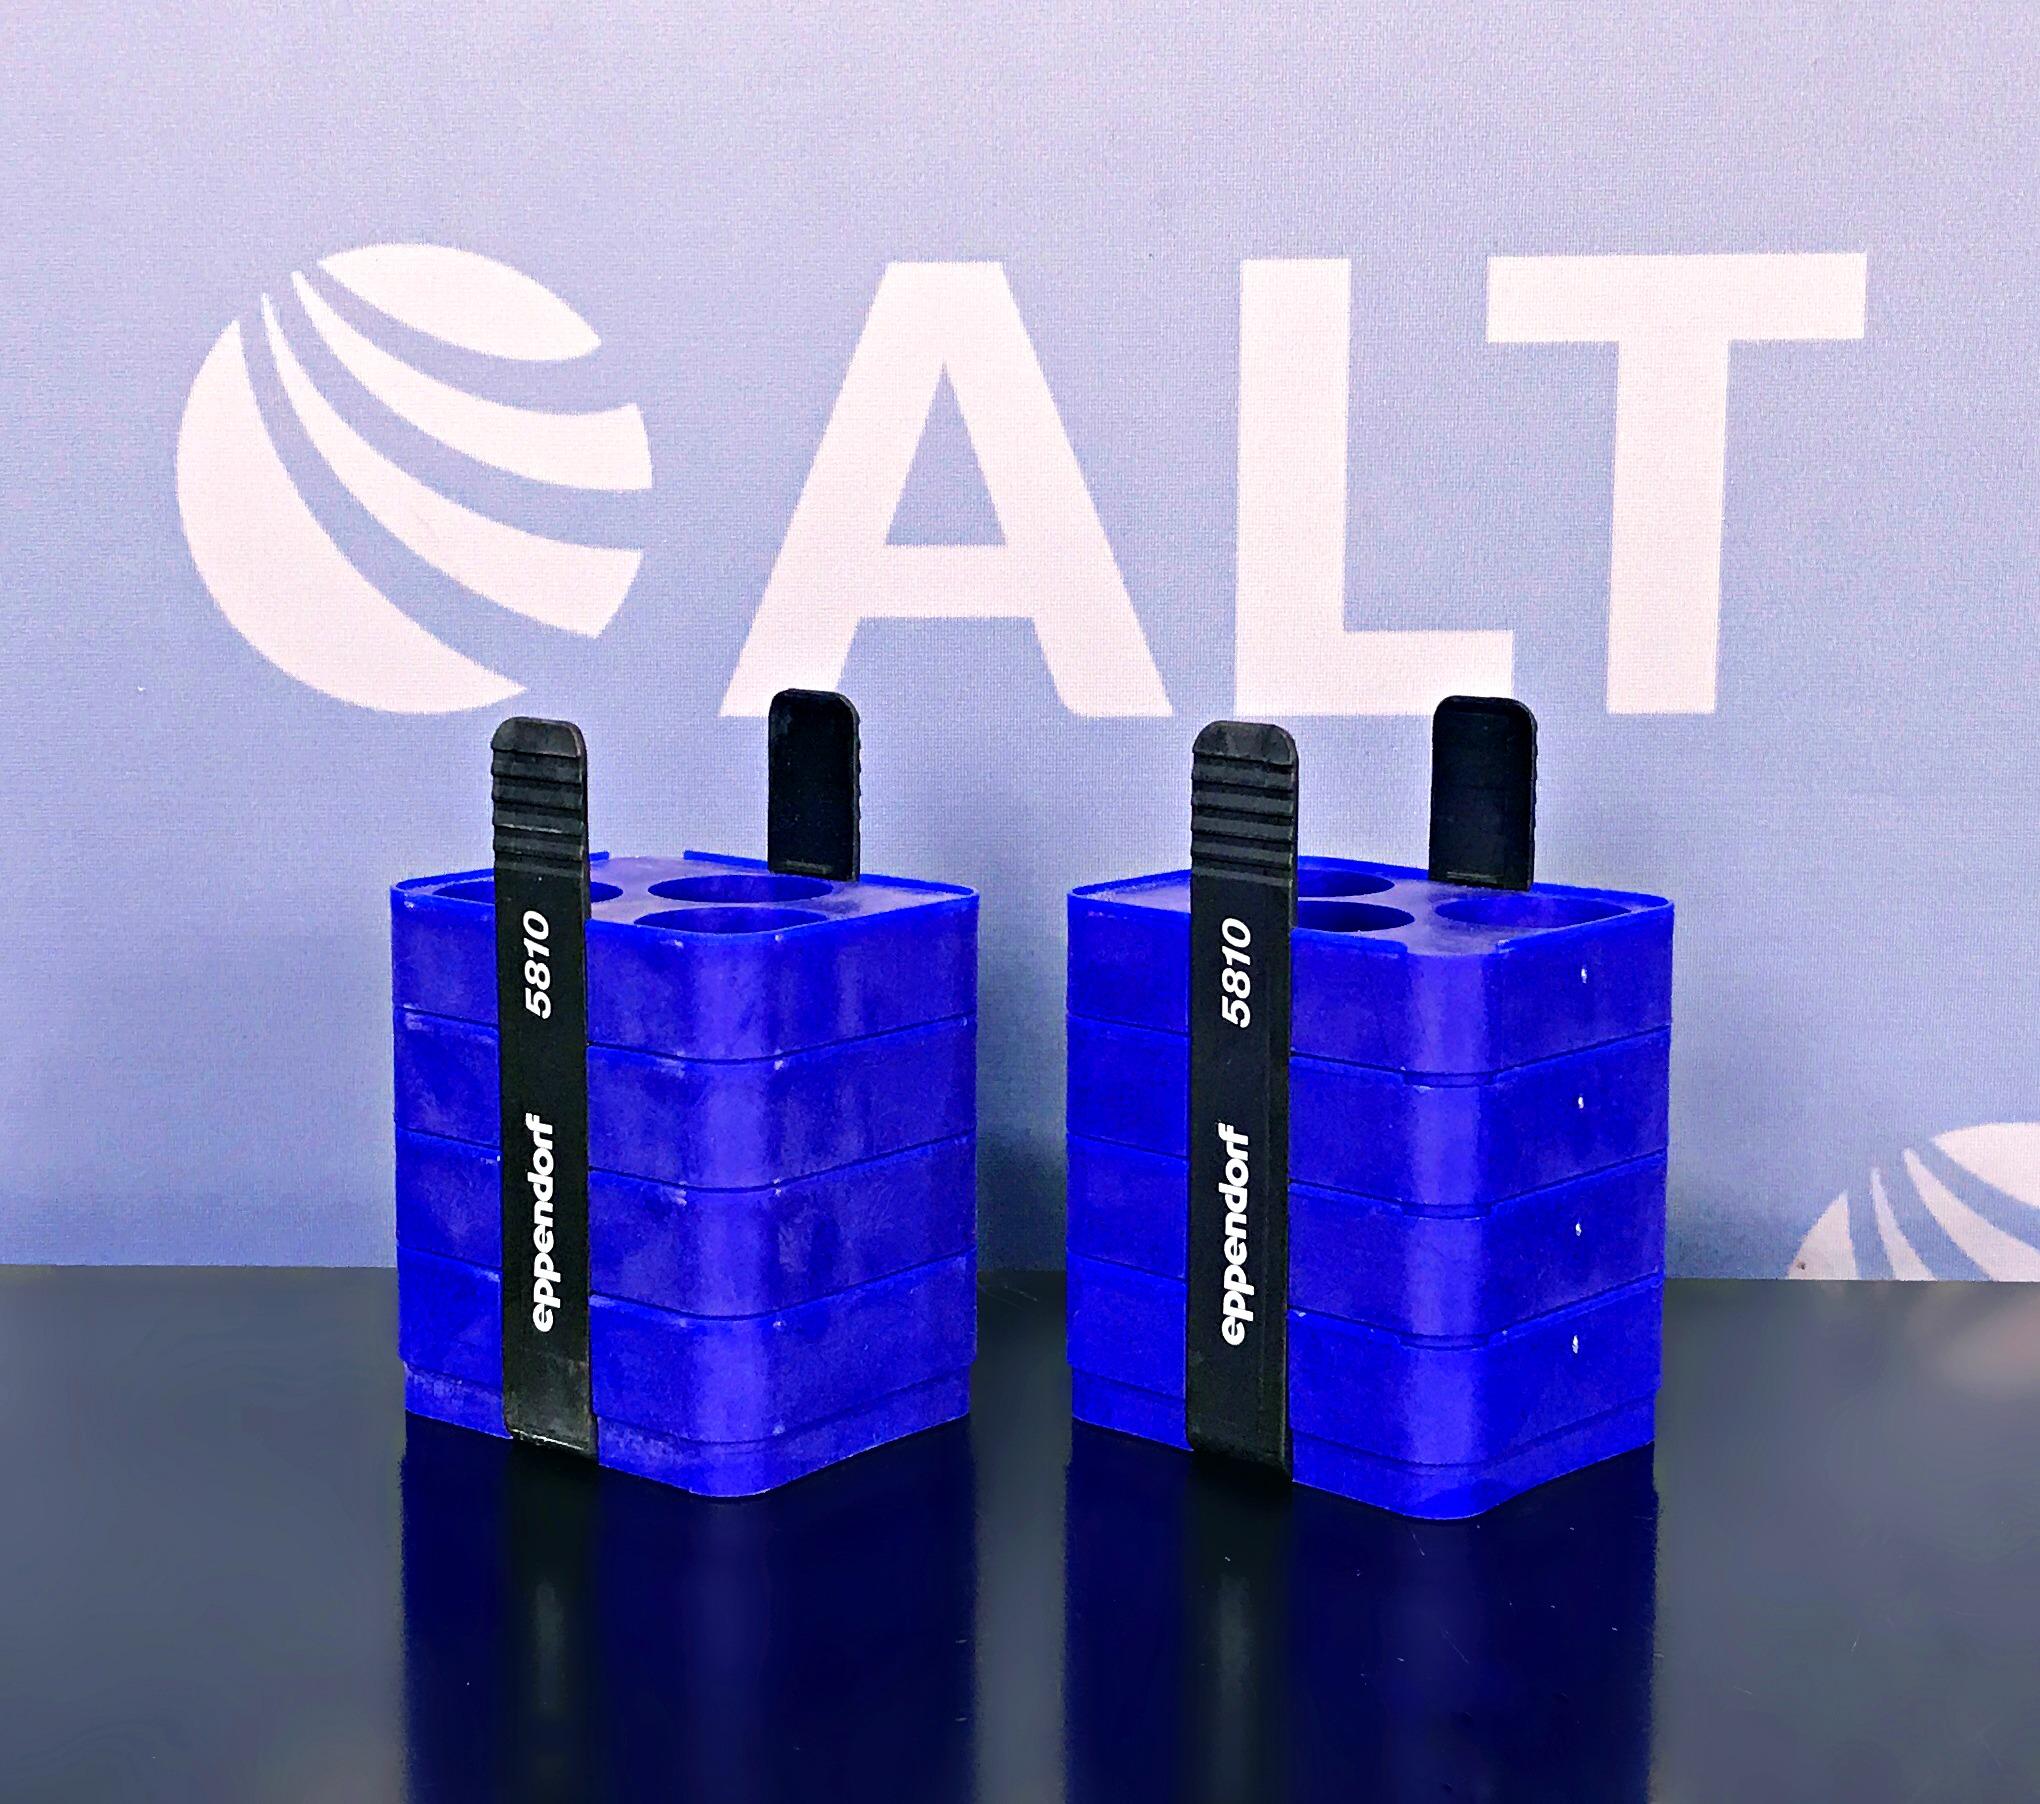 Eppendorf 5810 (3) Tube Slot Adapter for 250 mL Rectangular Bucket. 31mm: Conical Bottom (Set of 2) Image